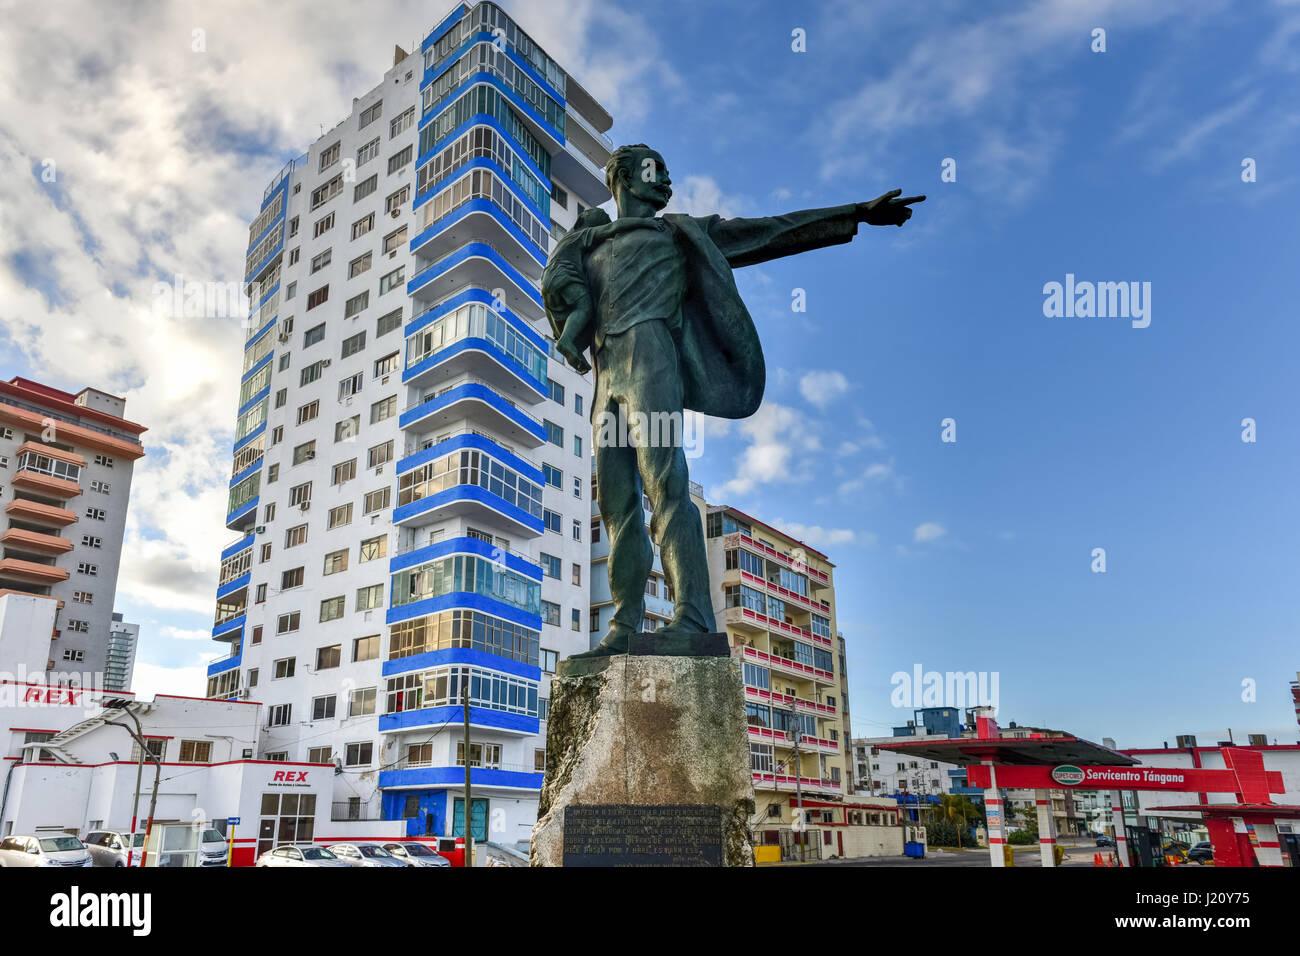 Havana, Cuba - Jan 15, 2017: Jose Marti Anti-Imperialist Platform across the street from the Embassy of the United - Stock Image